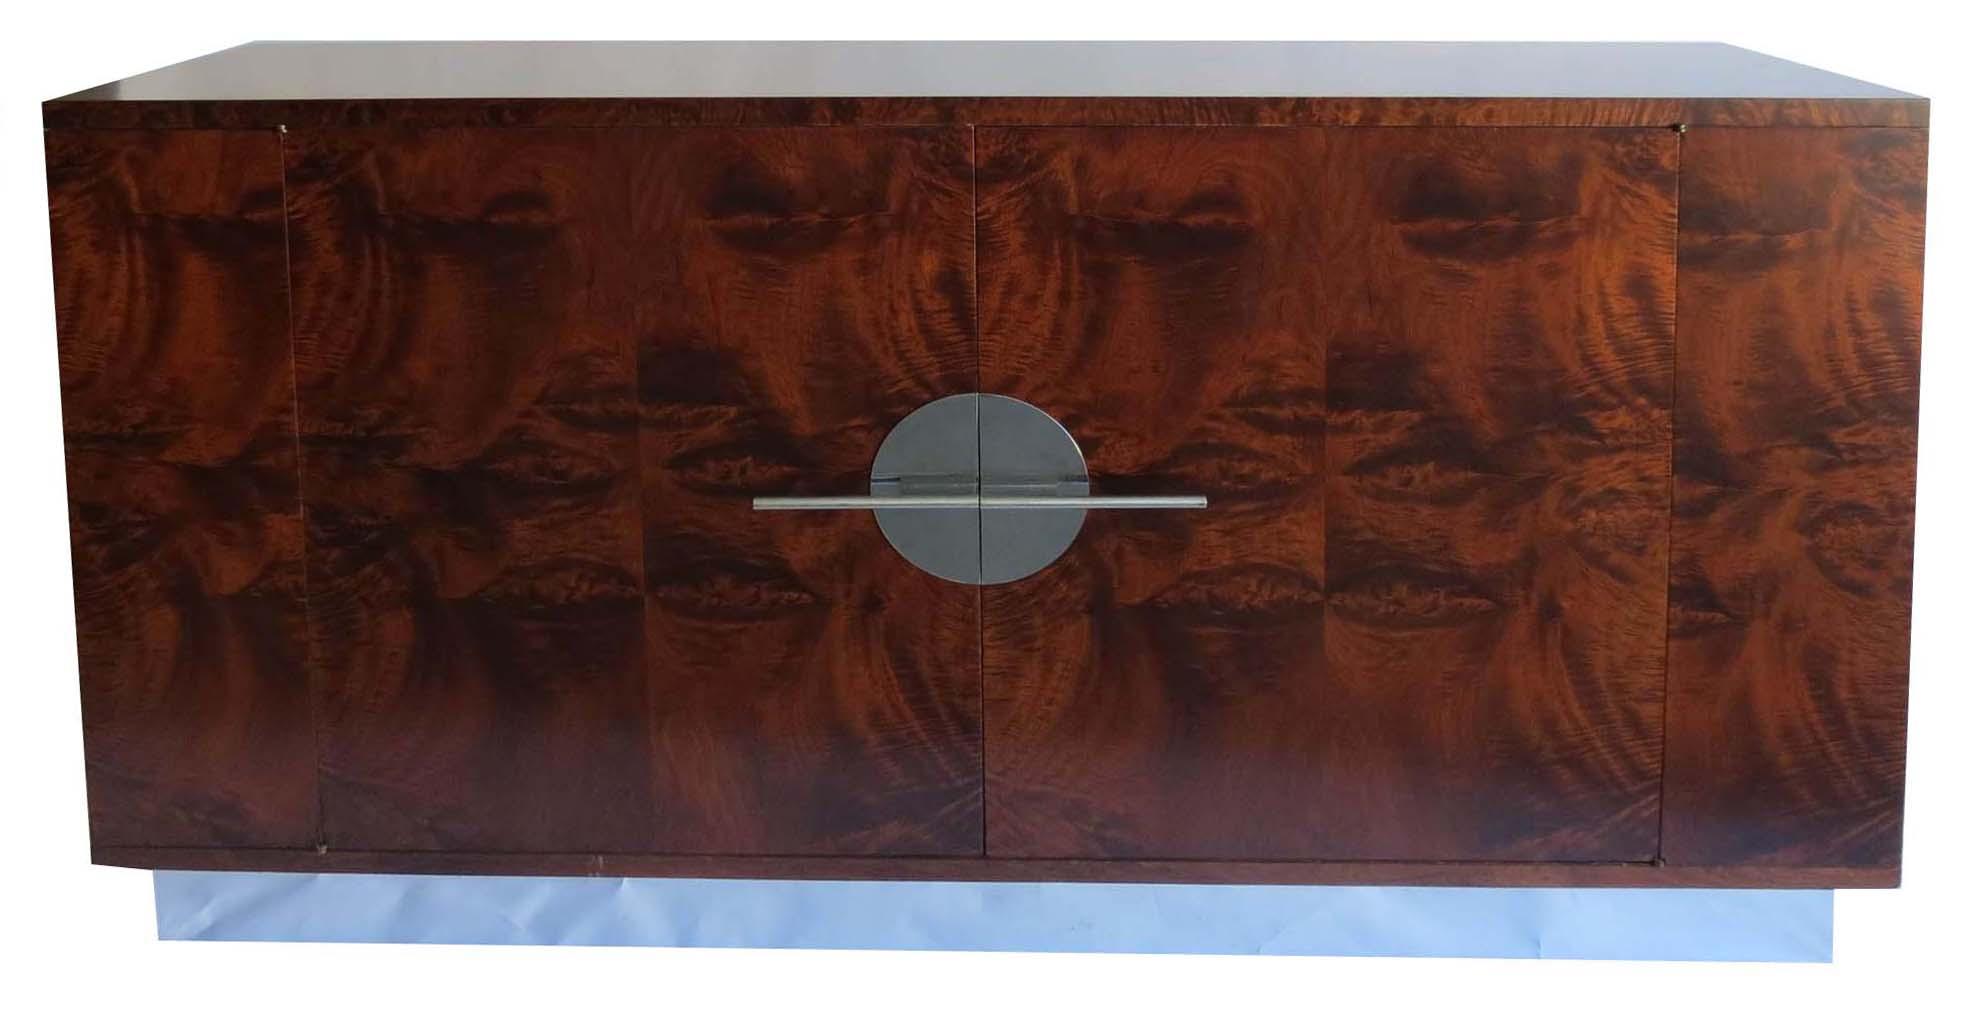 American Art Deco Walter Dorwin Teague Sideboard Modernism